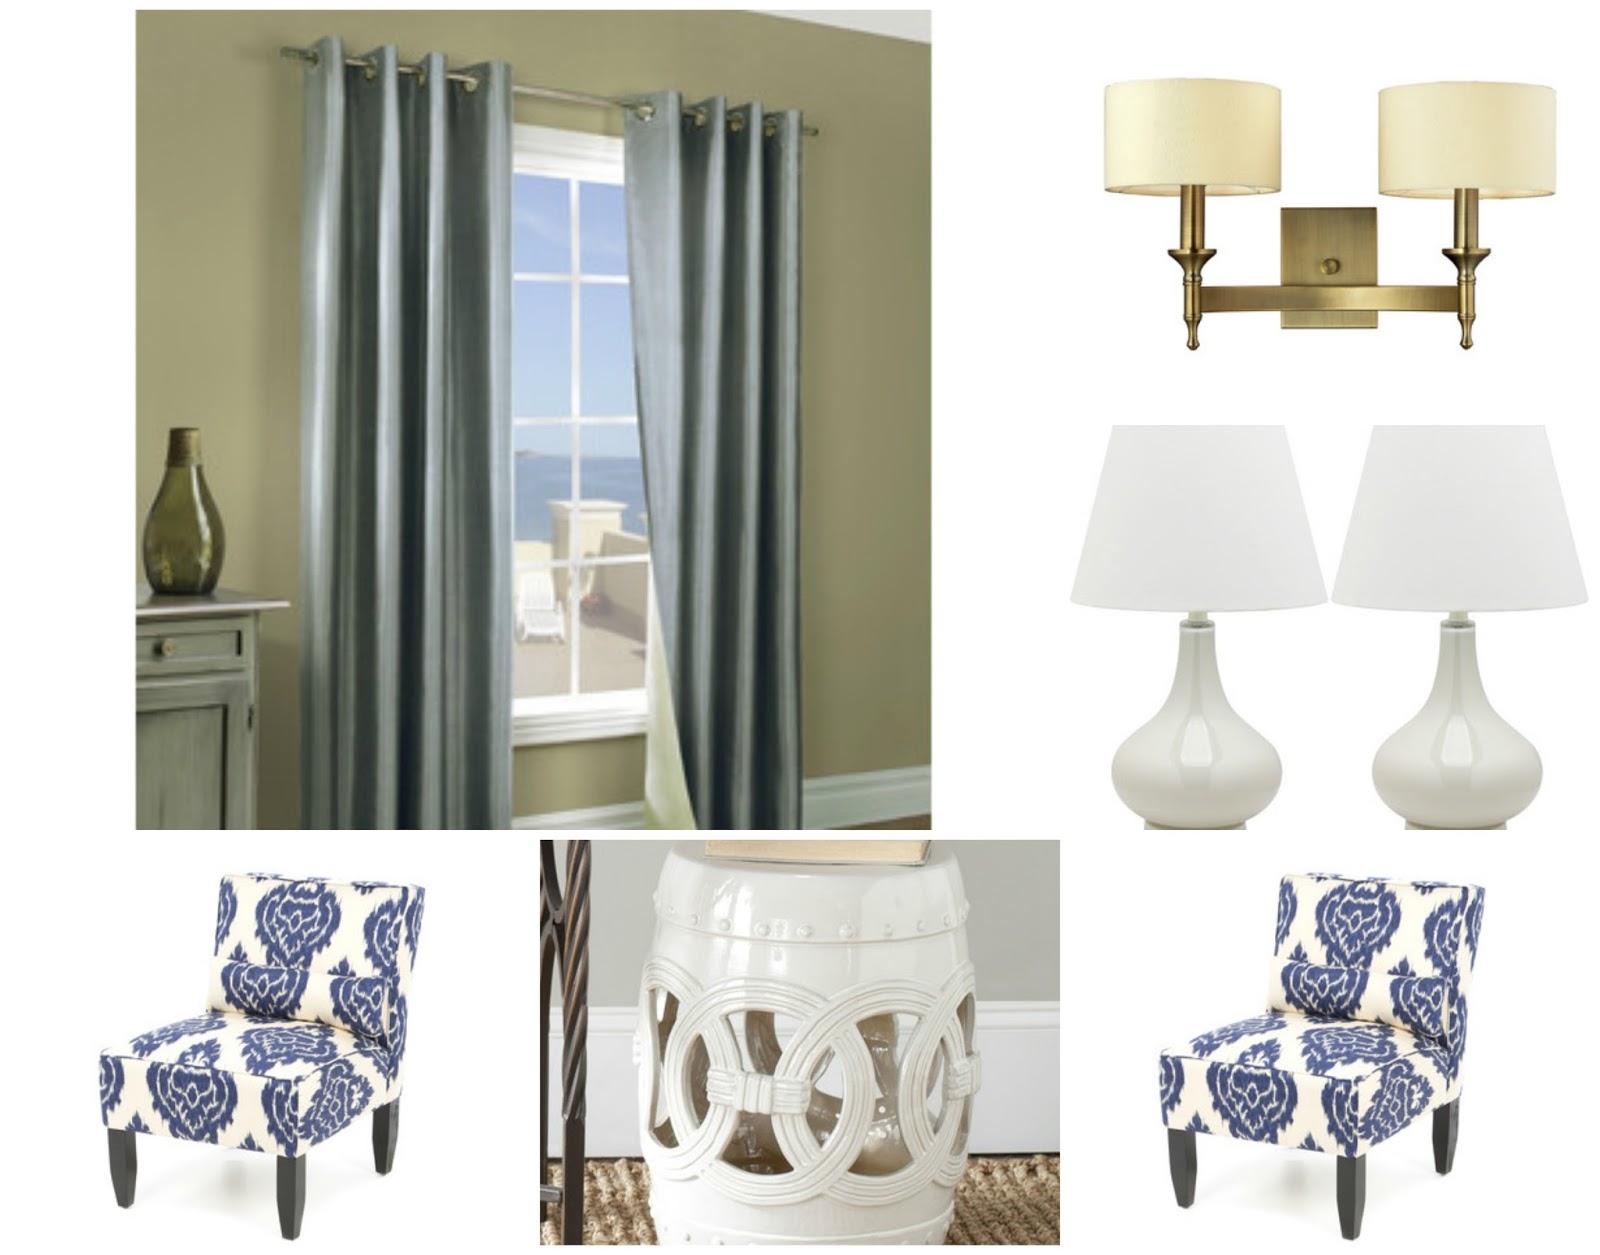 cosy carolina havahd house and wayfair. Black Bedroom Furniture Sets. Home Design Ideas